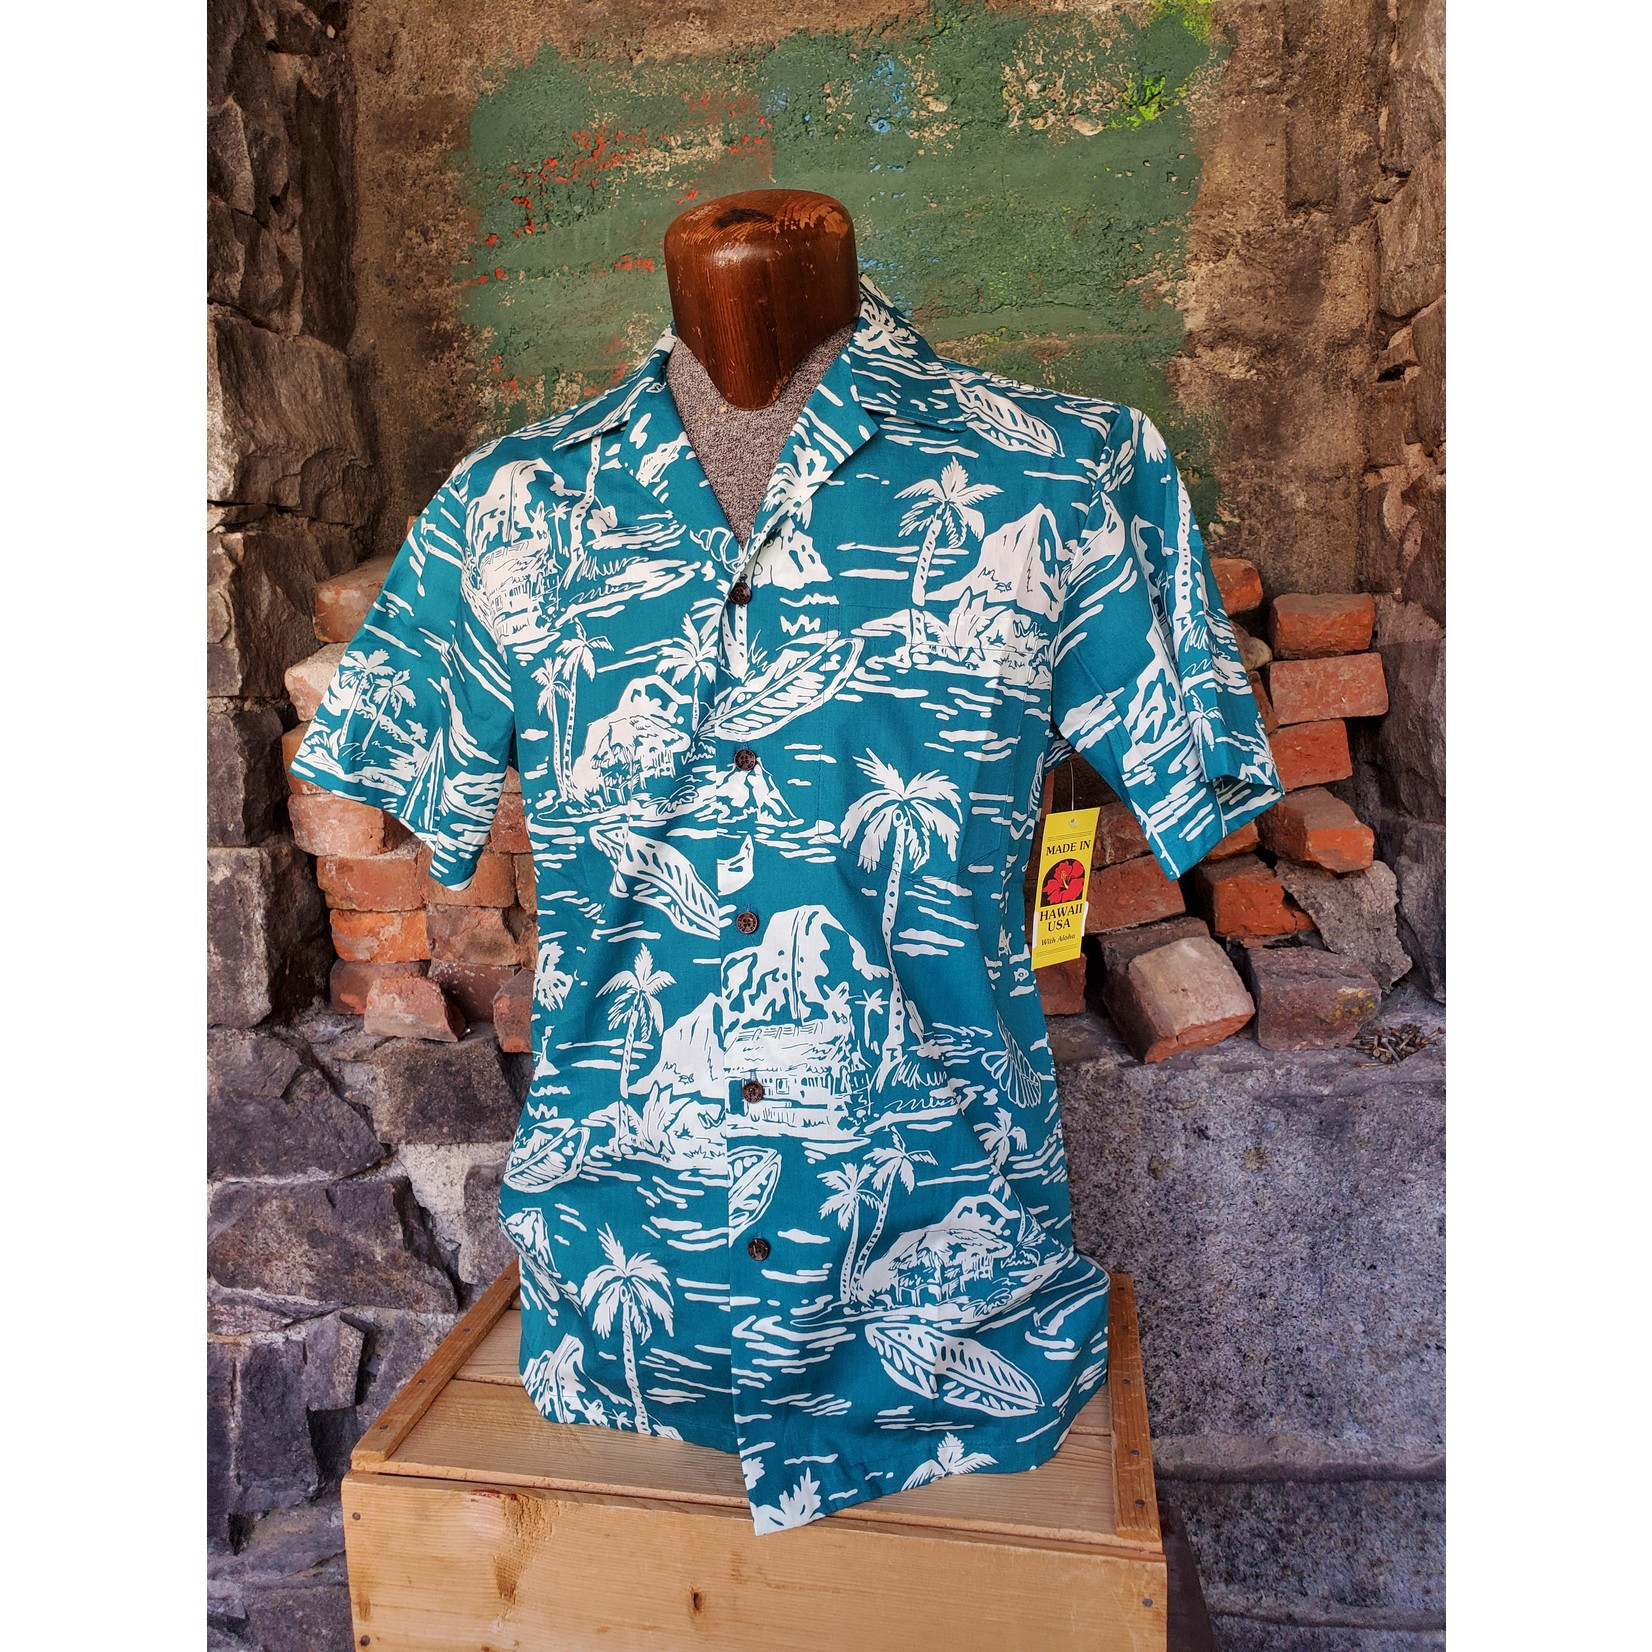 RJC Authentic Hawaiian Shirt - Impressionist Teal